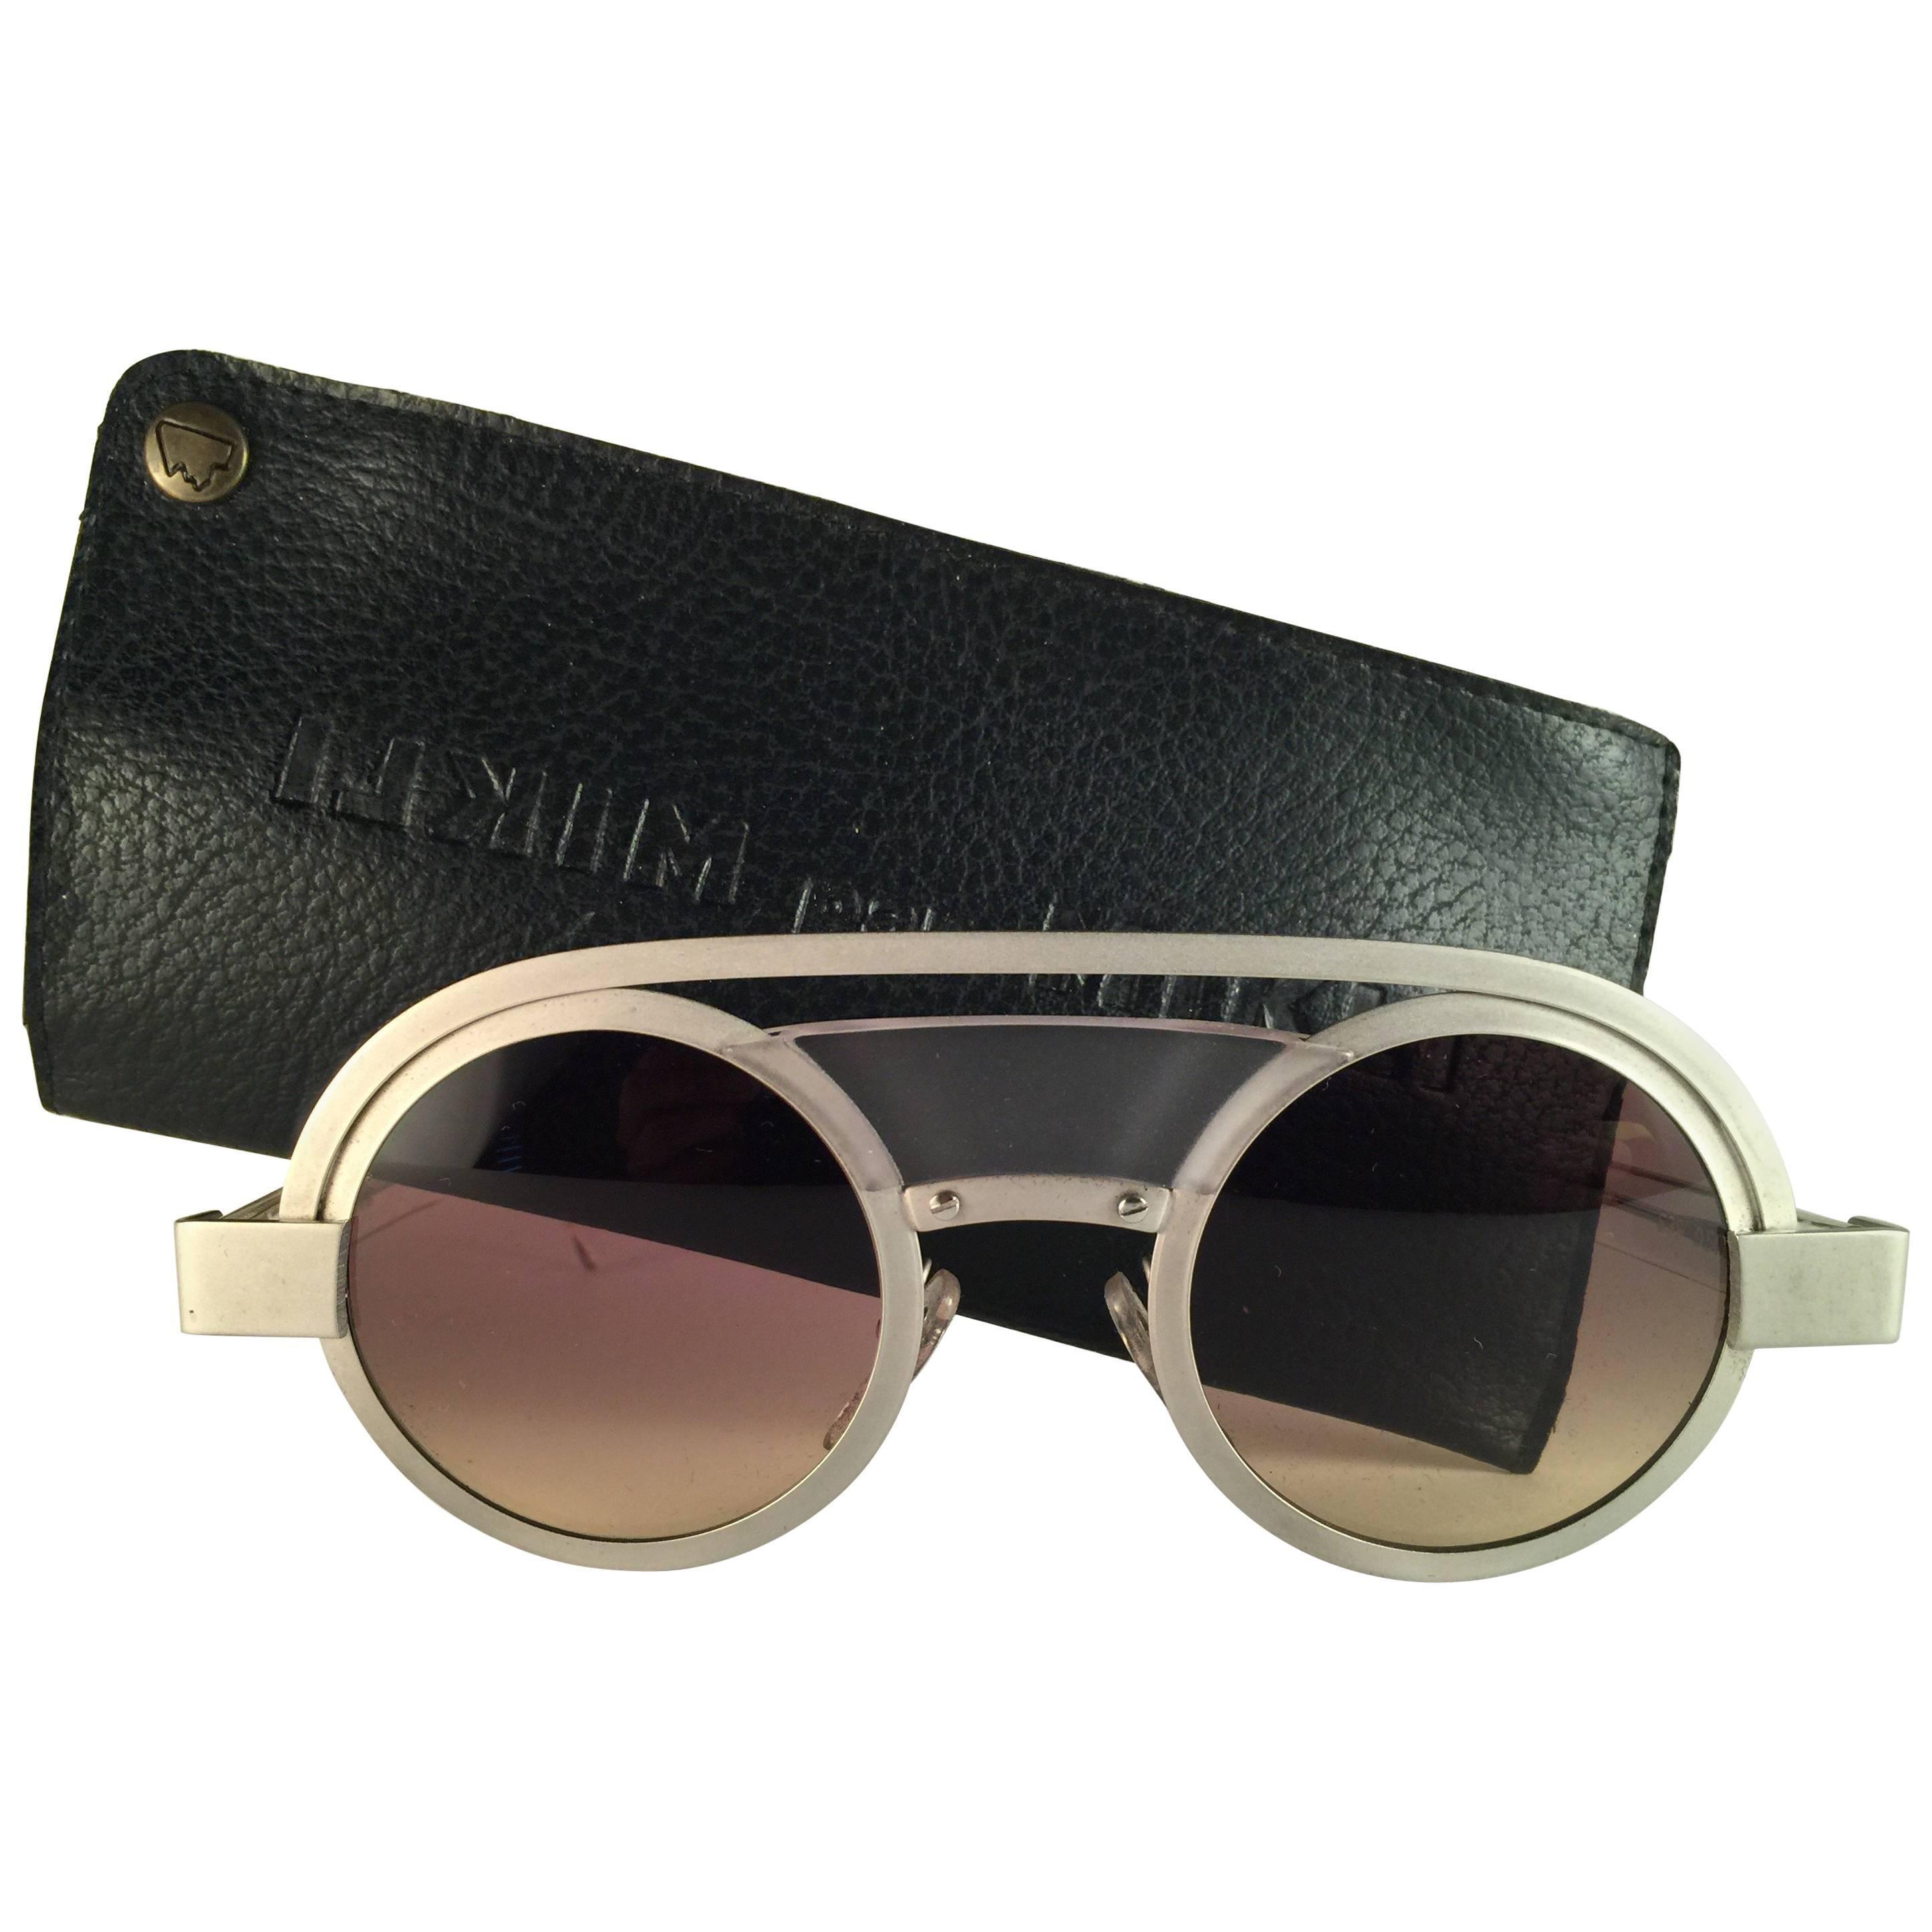 efe1a180de86 New Vintage Rare Alain Mikli 639 Round Aluminium France Sunglasses 1980 at  1stdibs